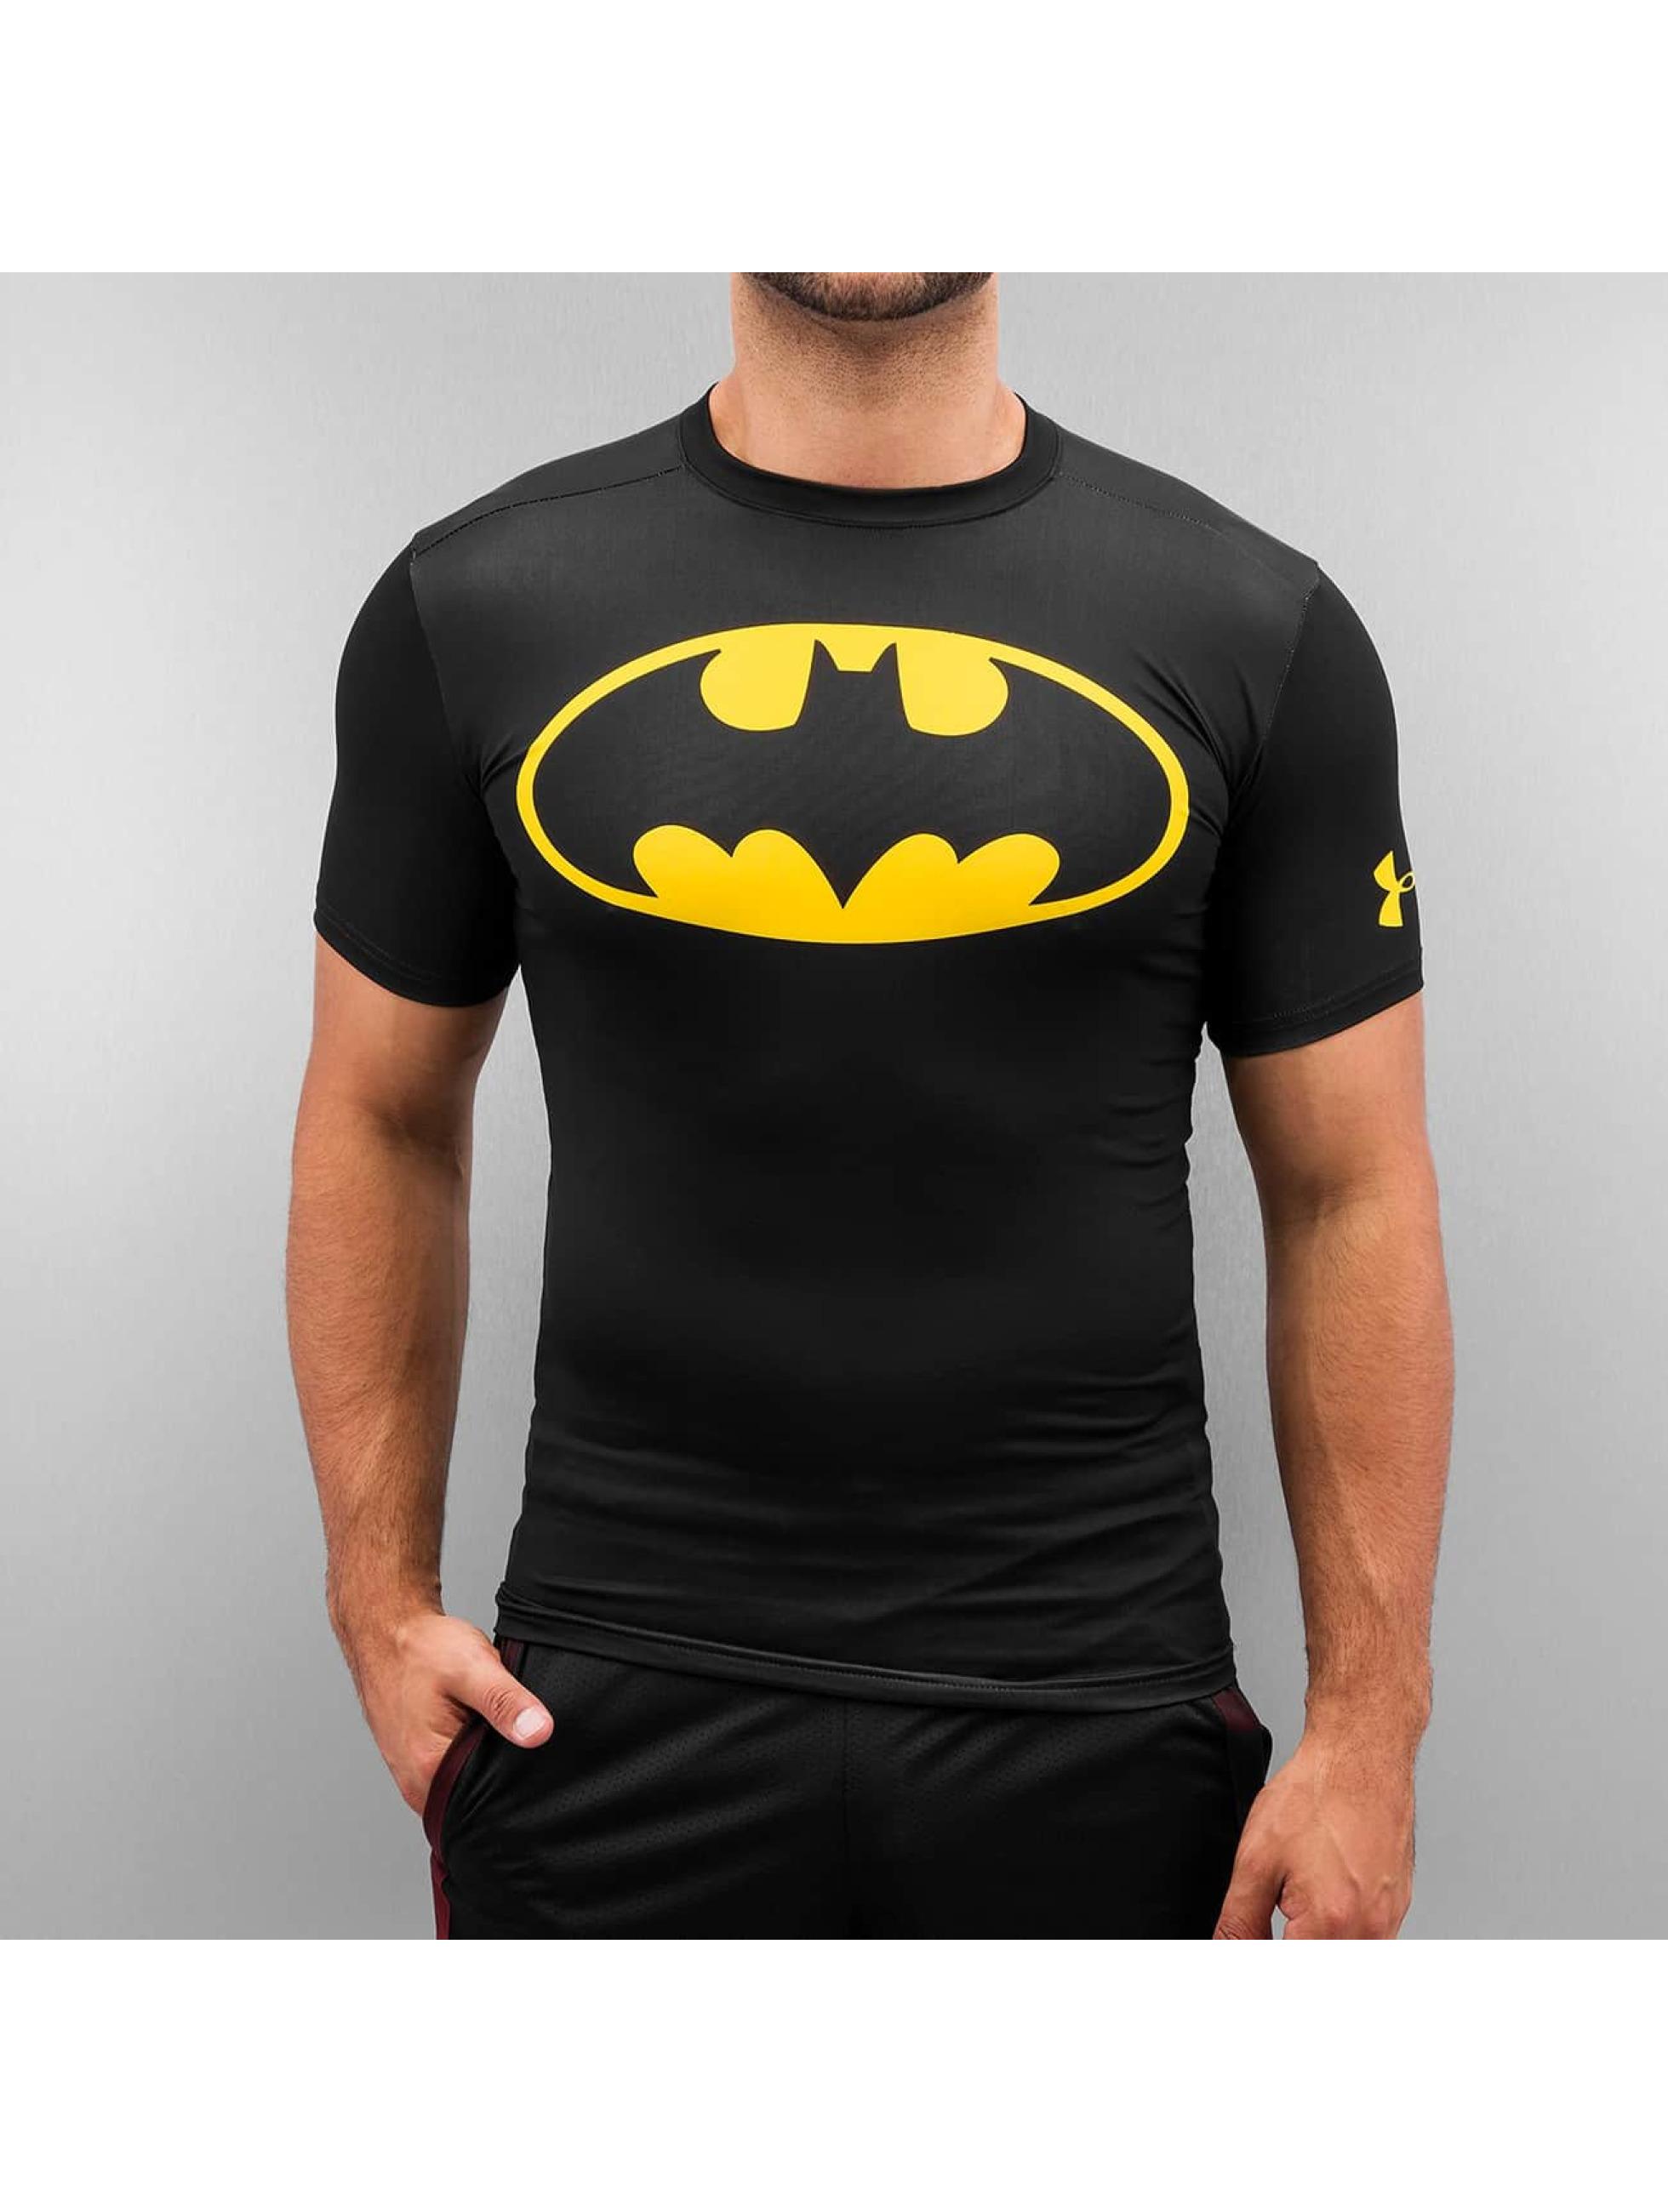 Under Armour t-shirt Alter Ego Batman Compression zwart